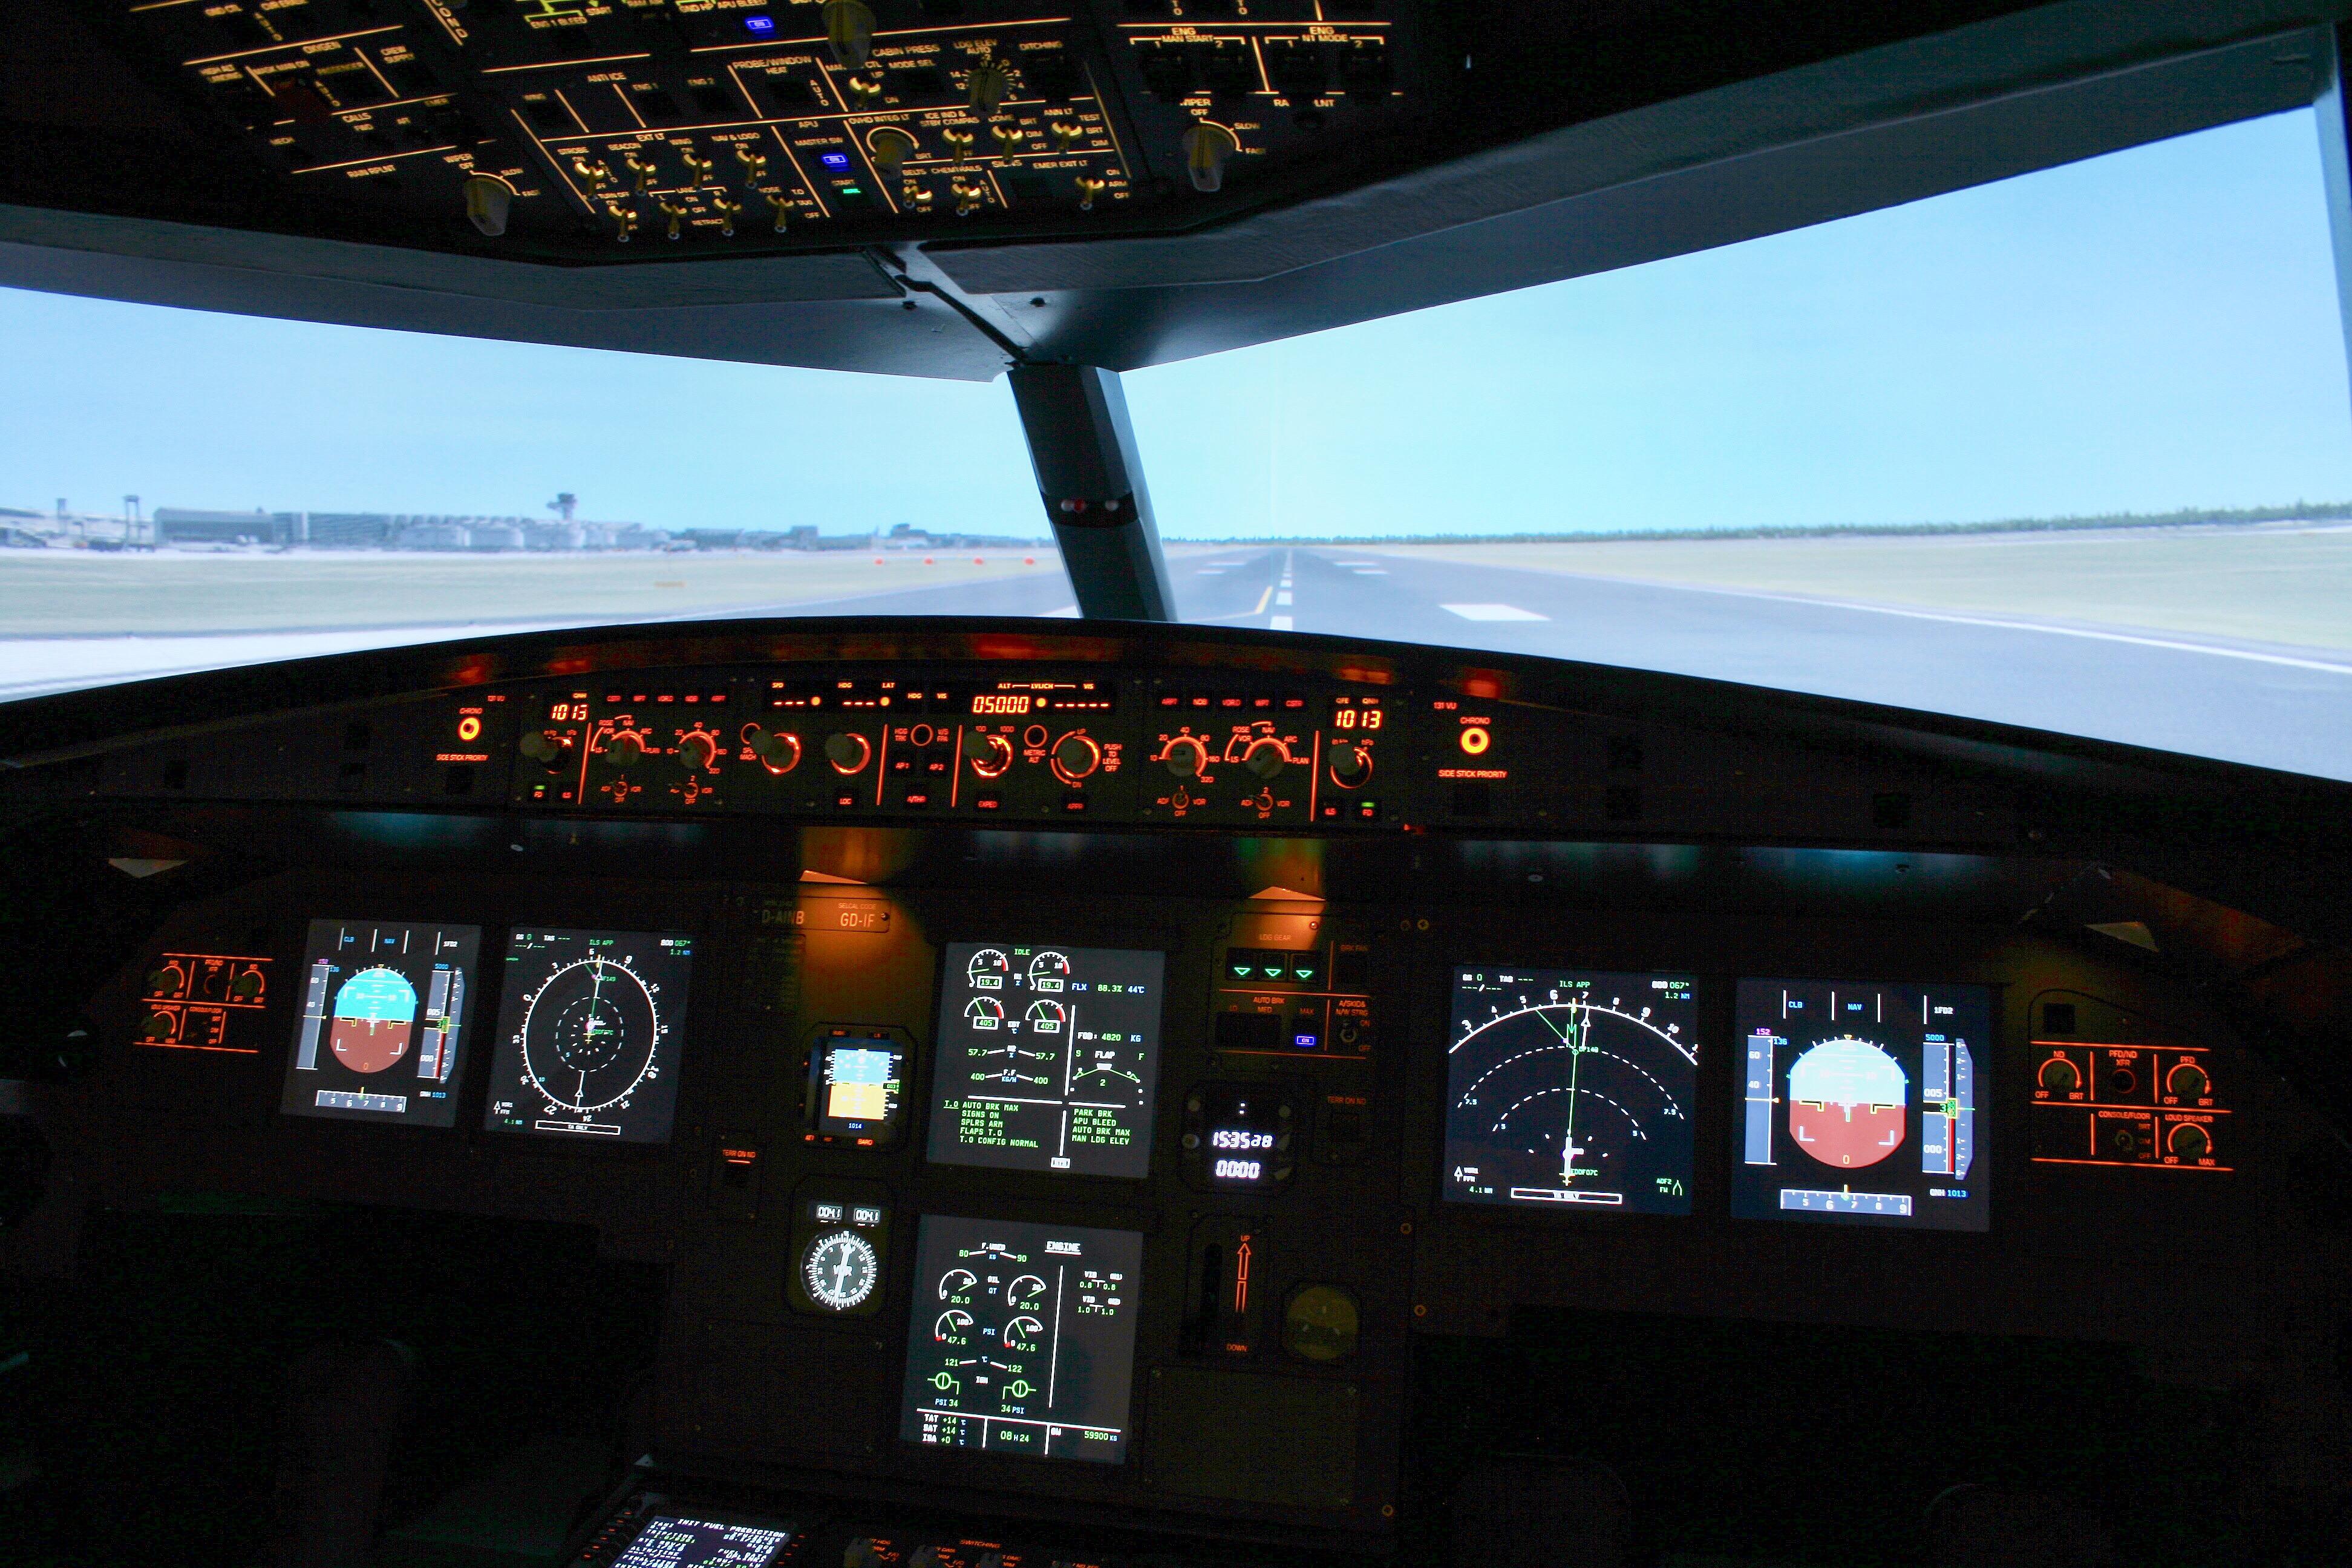 Airbus A320, Northbound